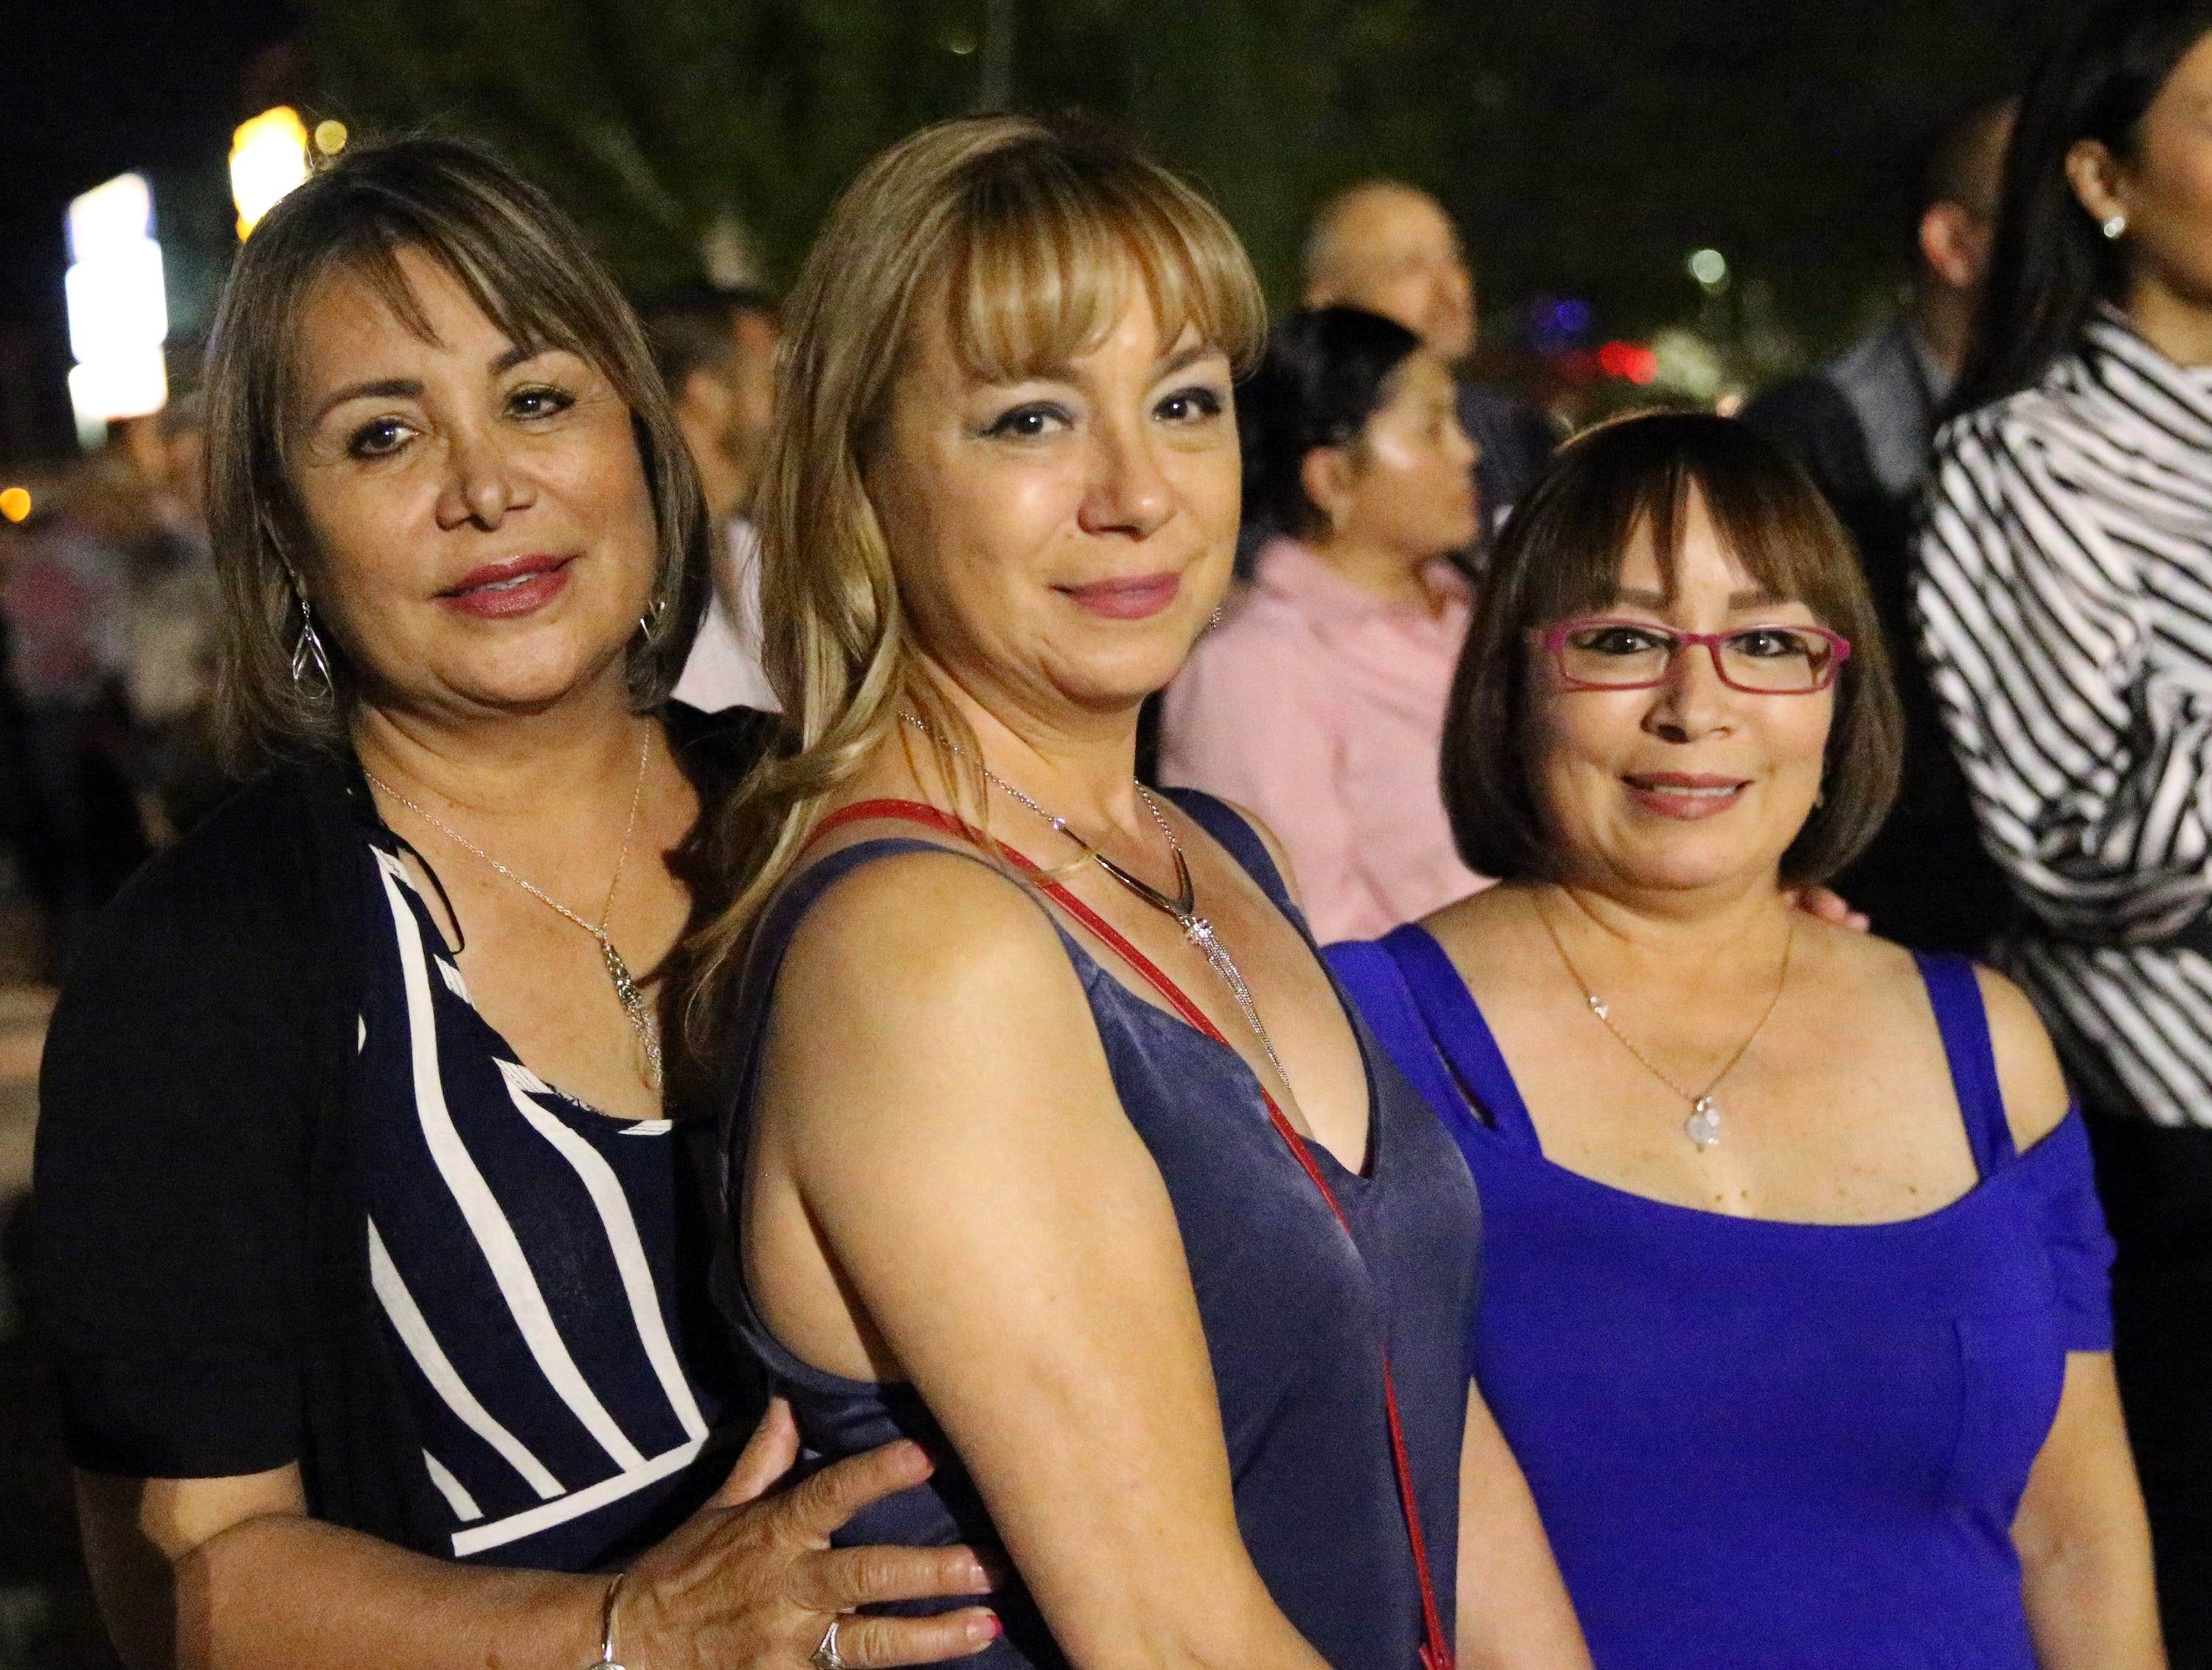 L-R: Rebecca Ornelas, Yolanda Carbajal and Bertha Rios.